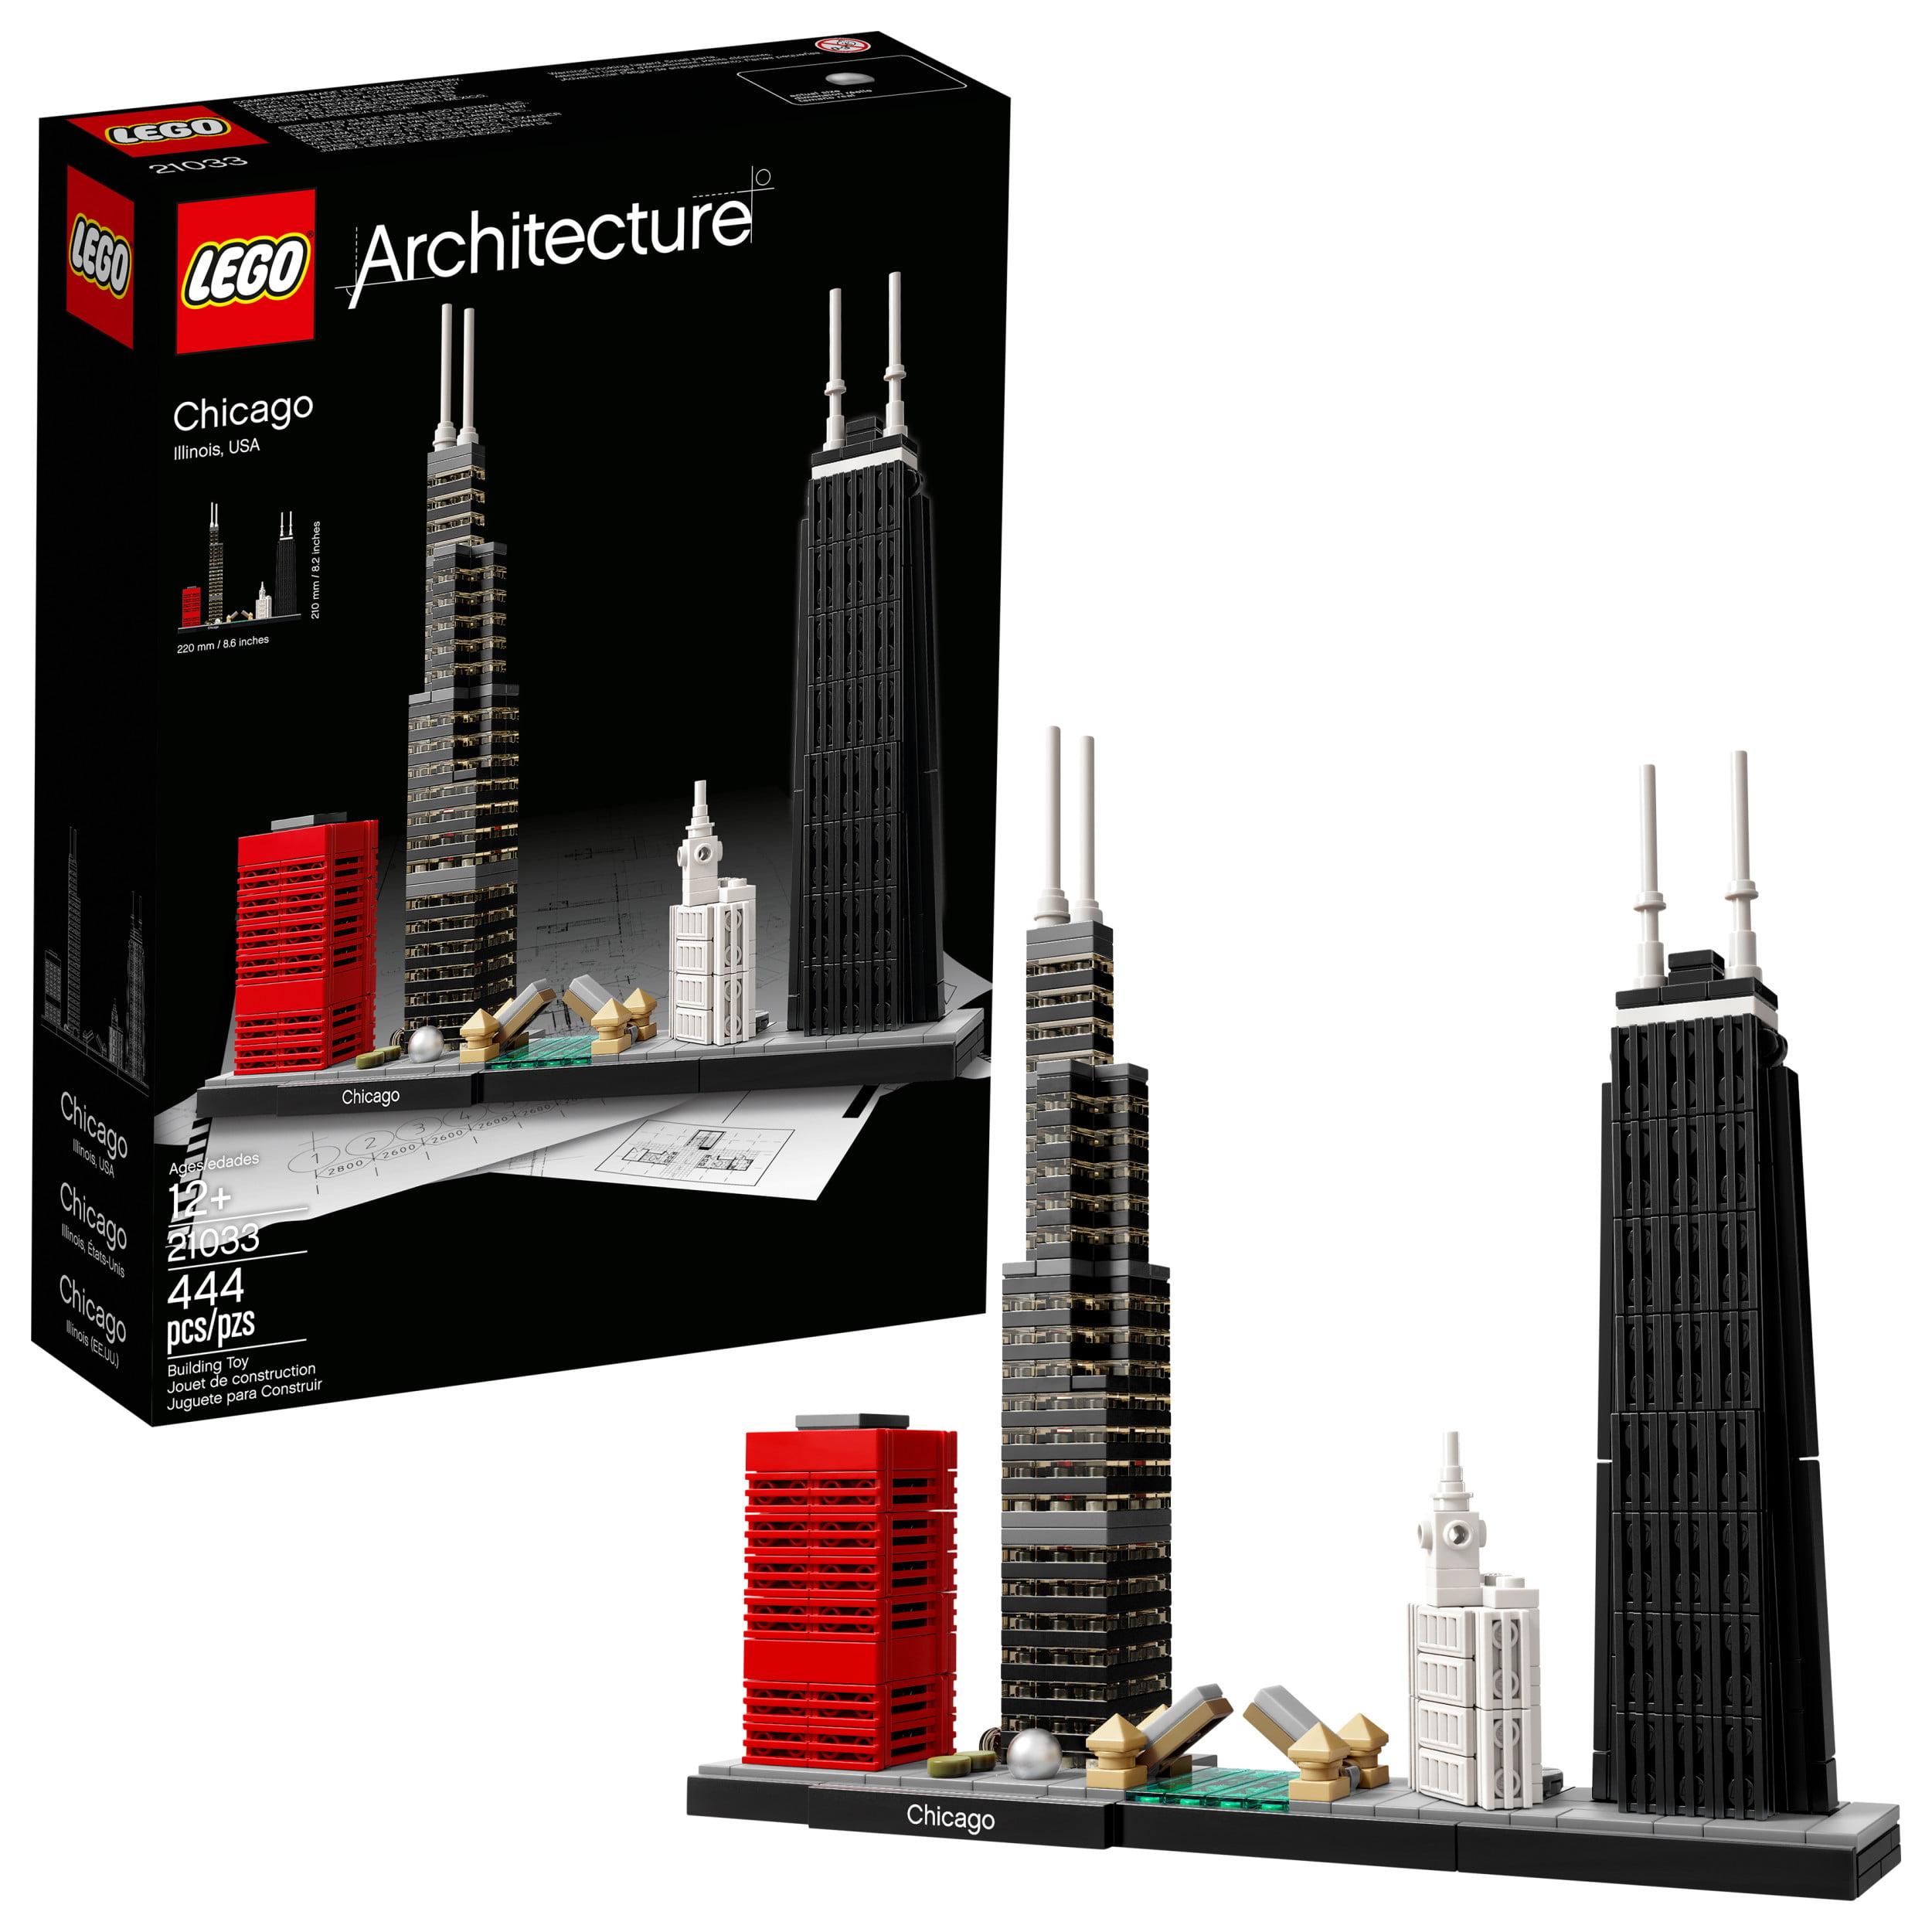 LEGO Architecture Chicago 21033